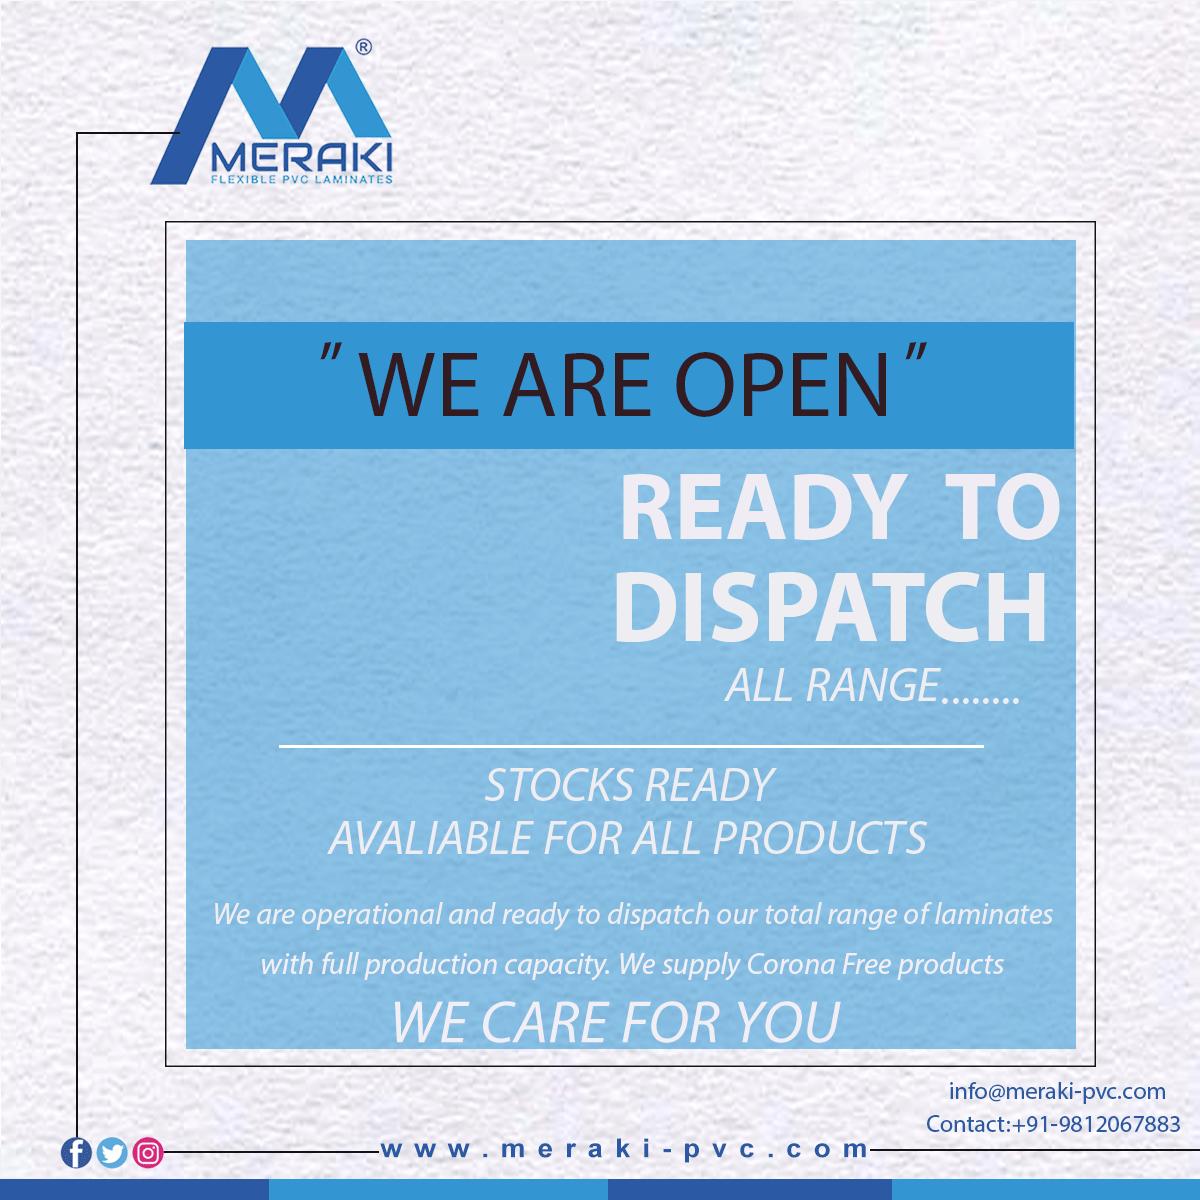 Merakipvclaminatesindia: We are Open, Ready to Dispatch  ................... We are operational and ready to dispatch our total range of laminates with full production capacity. We supply Corona Free products, we Care for you. Visit our website: www.meraki-pvc.com Contact:+91-9812067883 #merakiPVClaminates #Solid #HighGloss #Collections #colourcore #bestrange #fabulous #innovative #design  #90degreebendable #innovativedesigns #Homedecor #design #luxuryshades #Decorativelaminates #decor #Interior